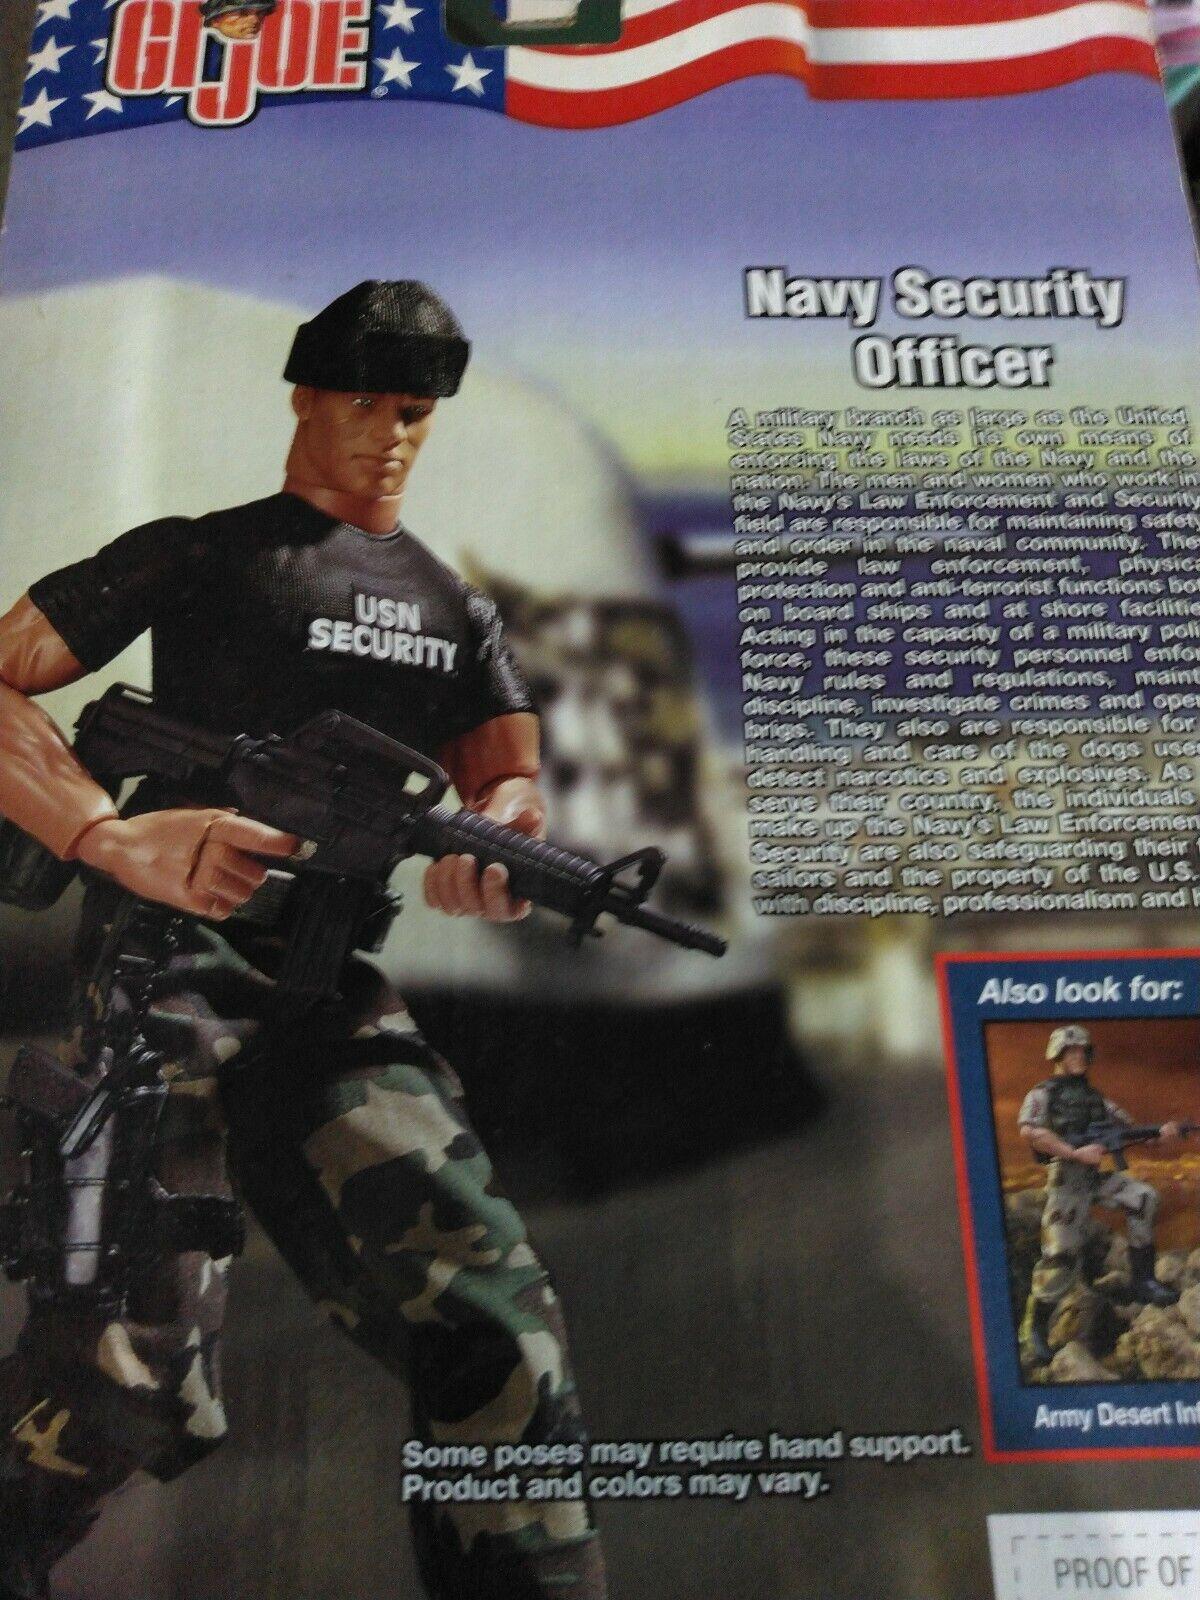 Gi Joe Navy Security Officer